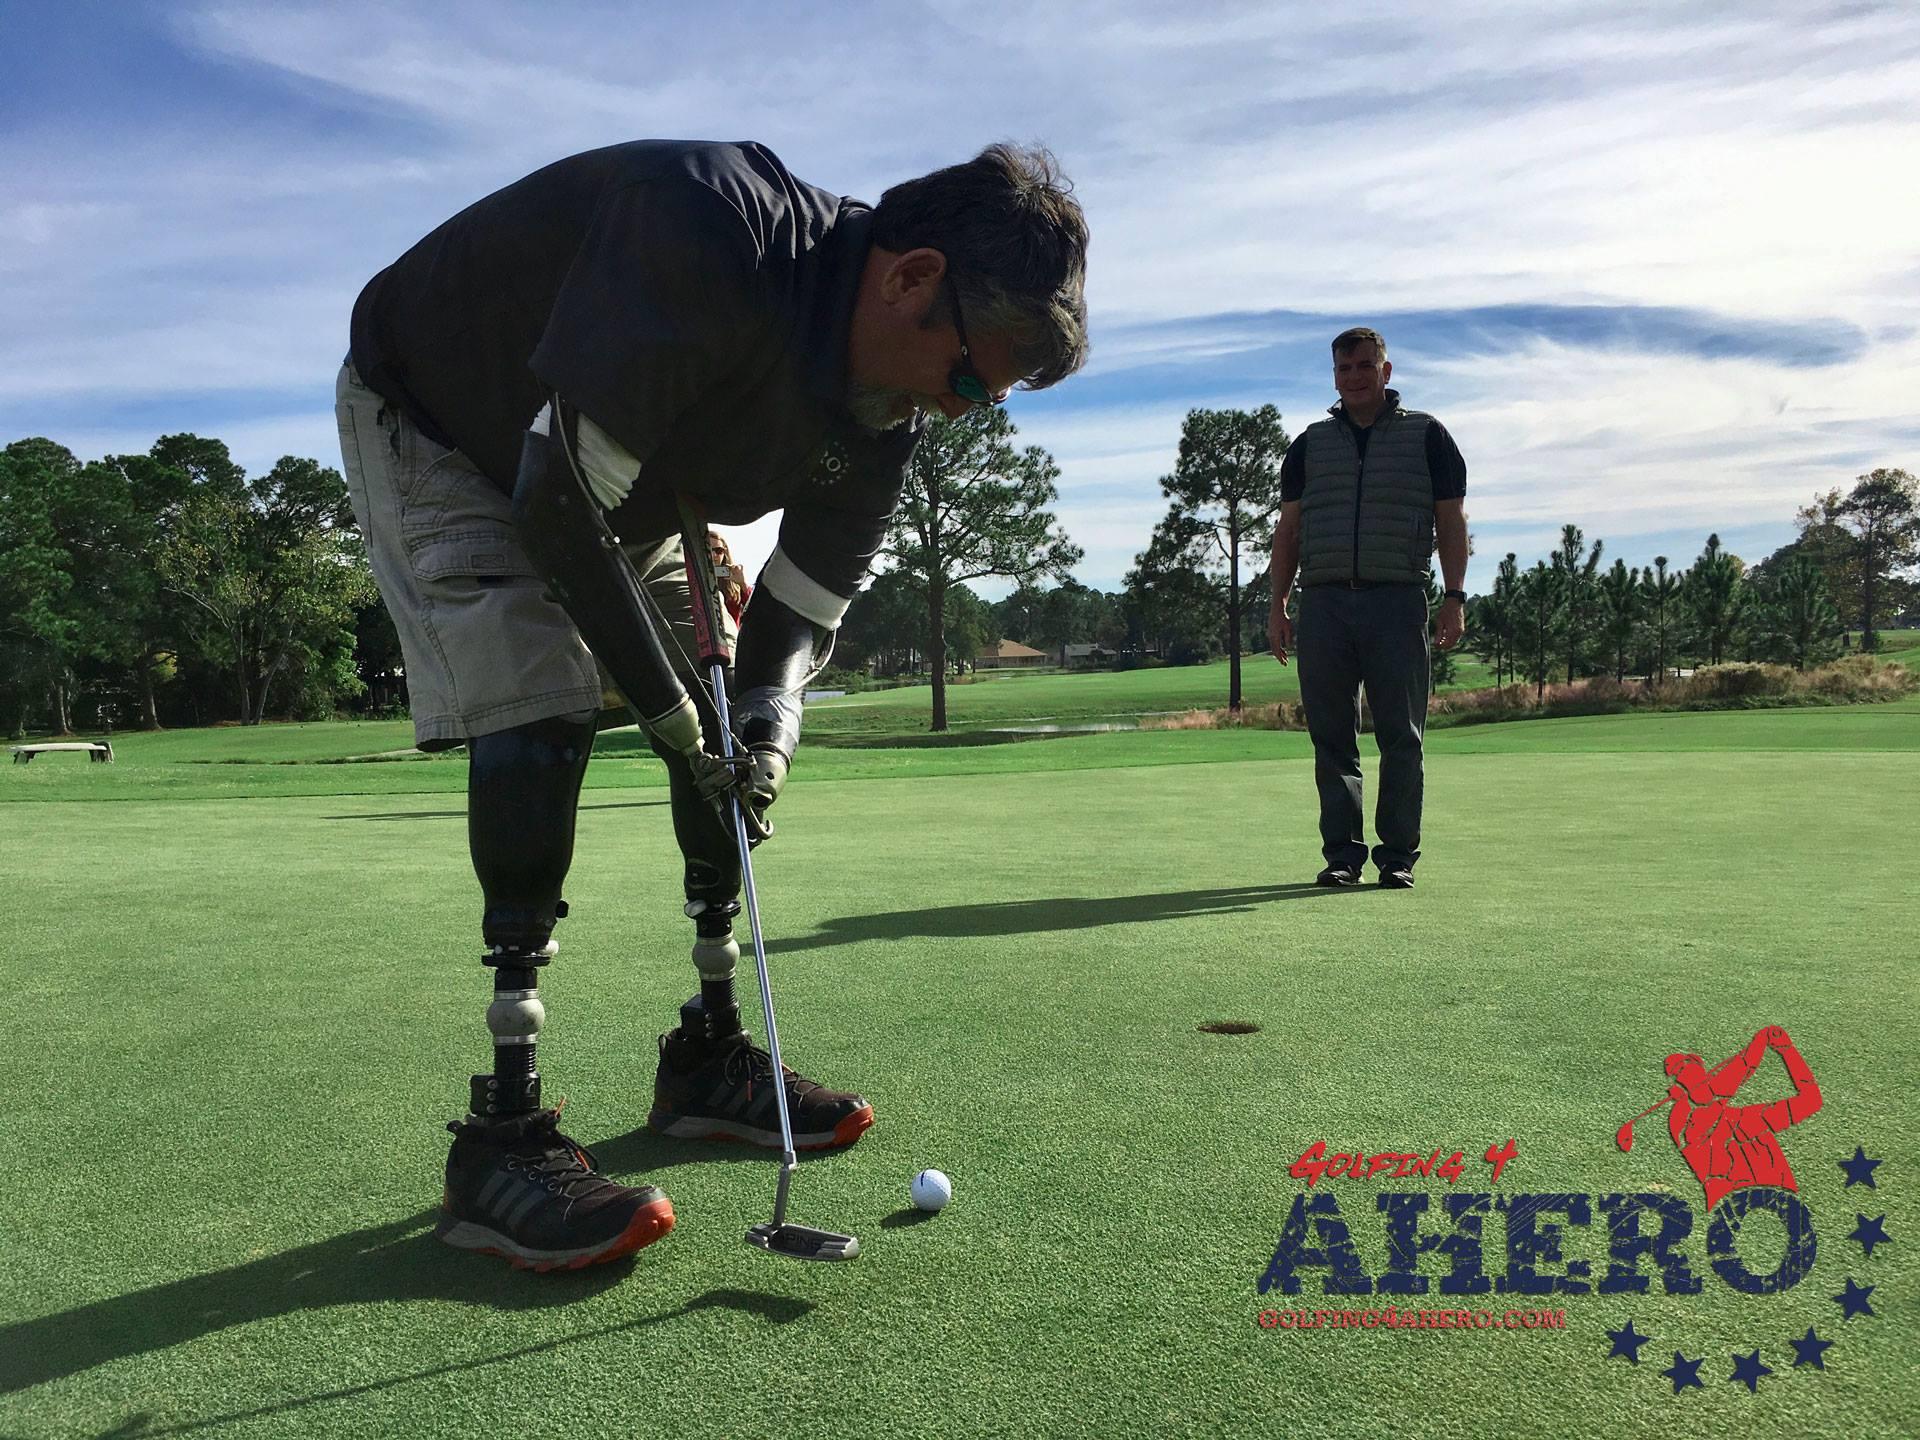 Golfing 4 AHERO